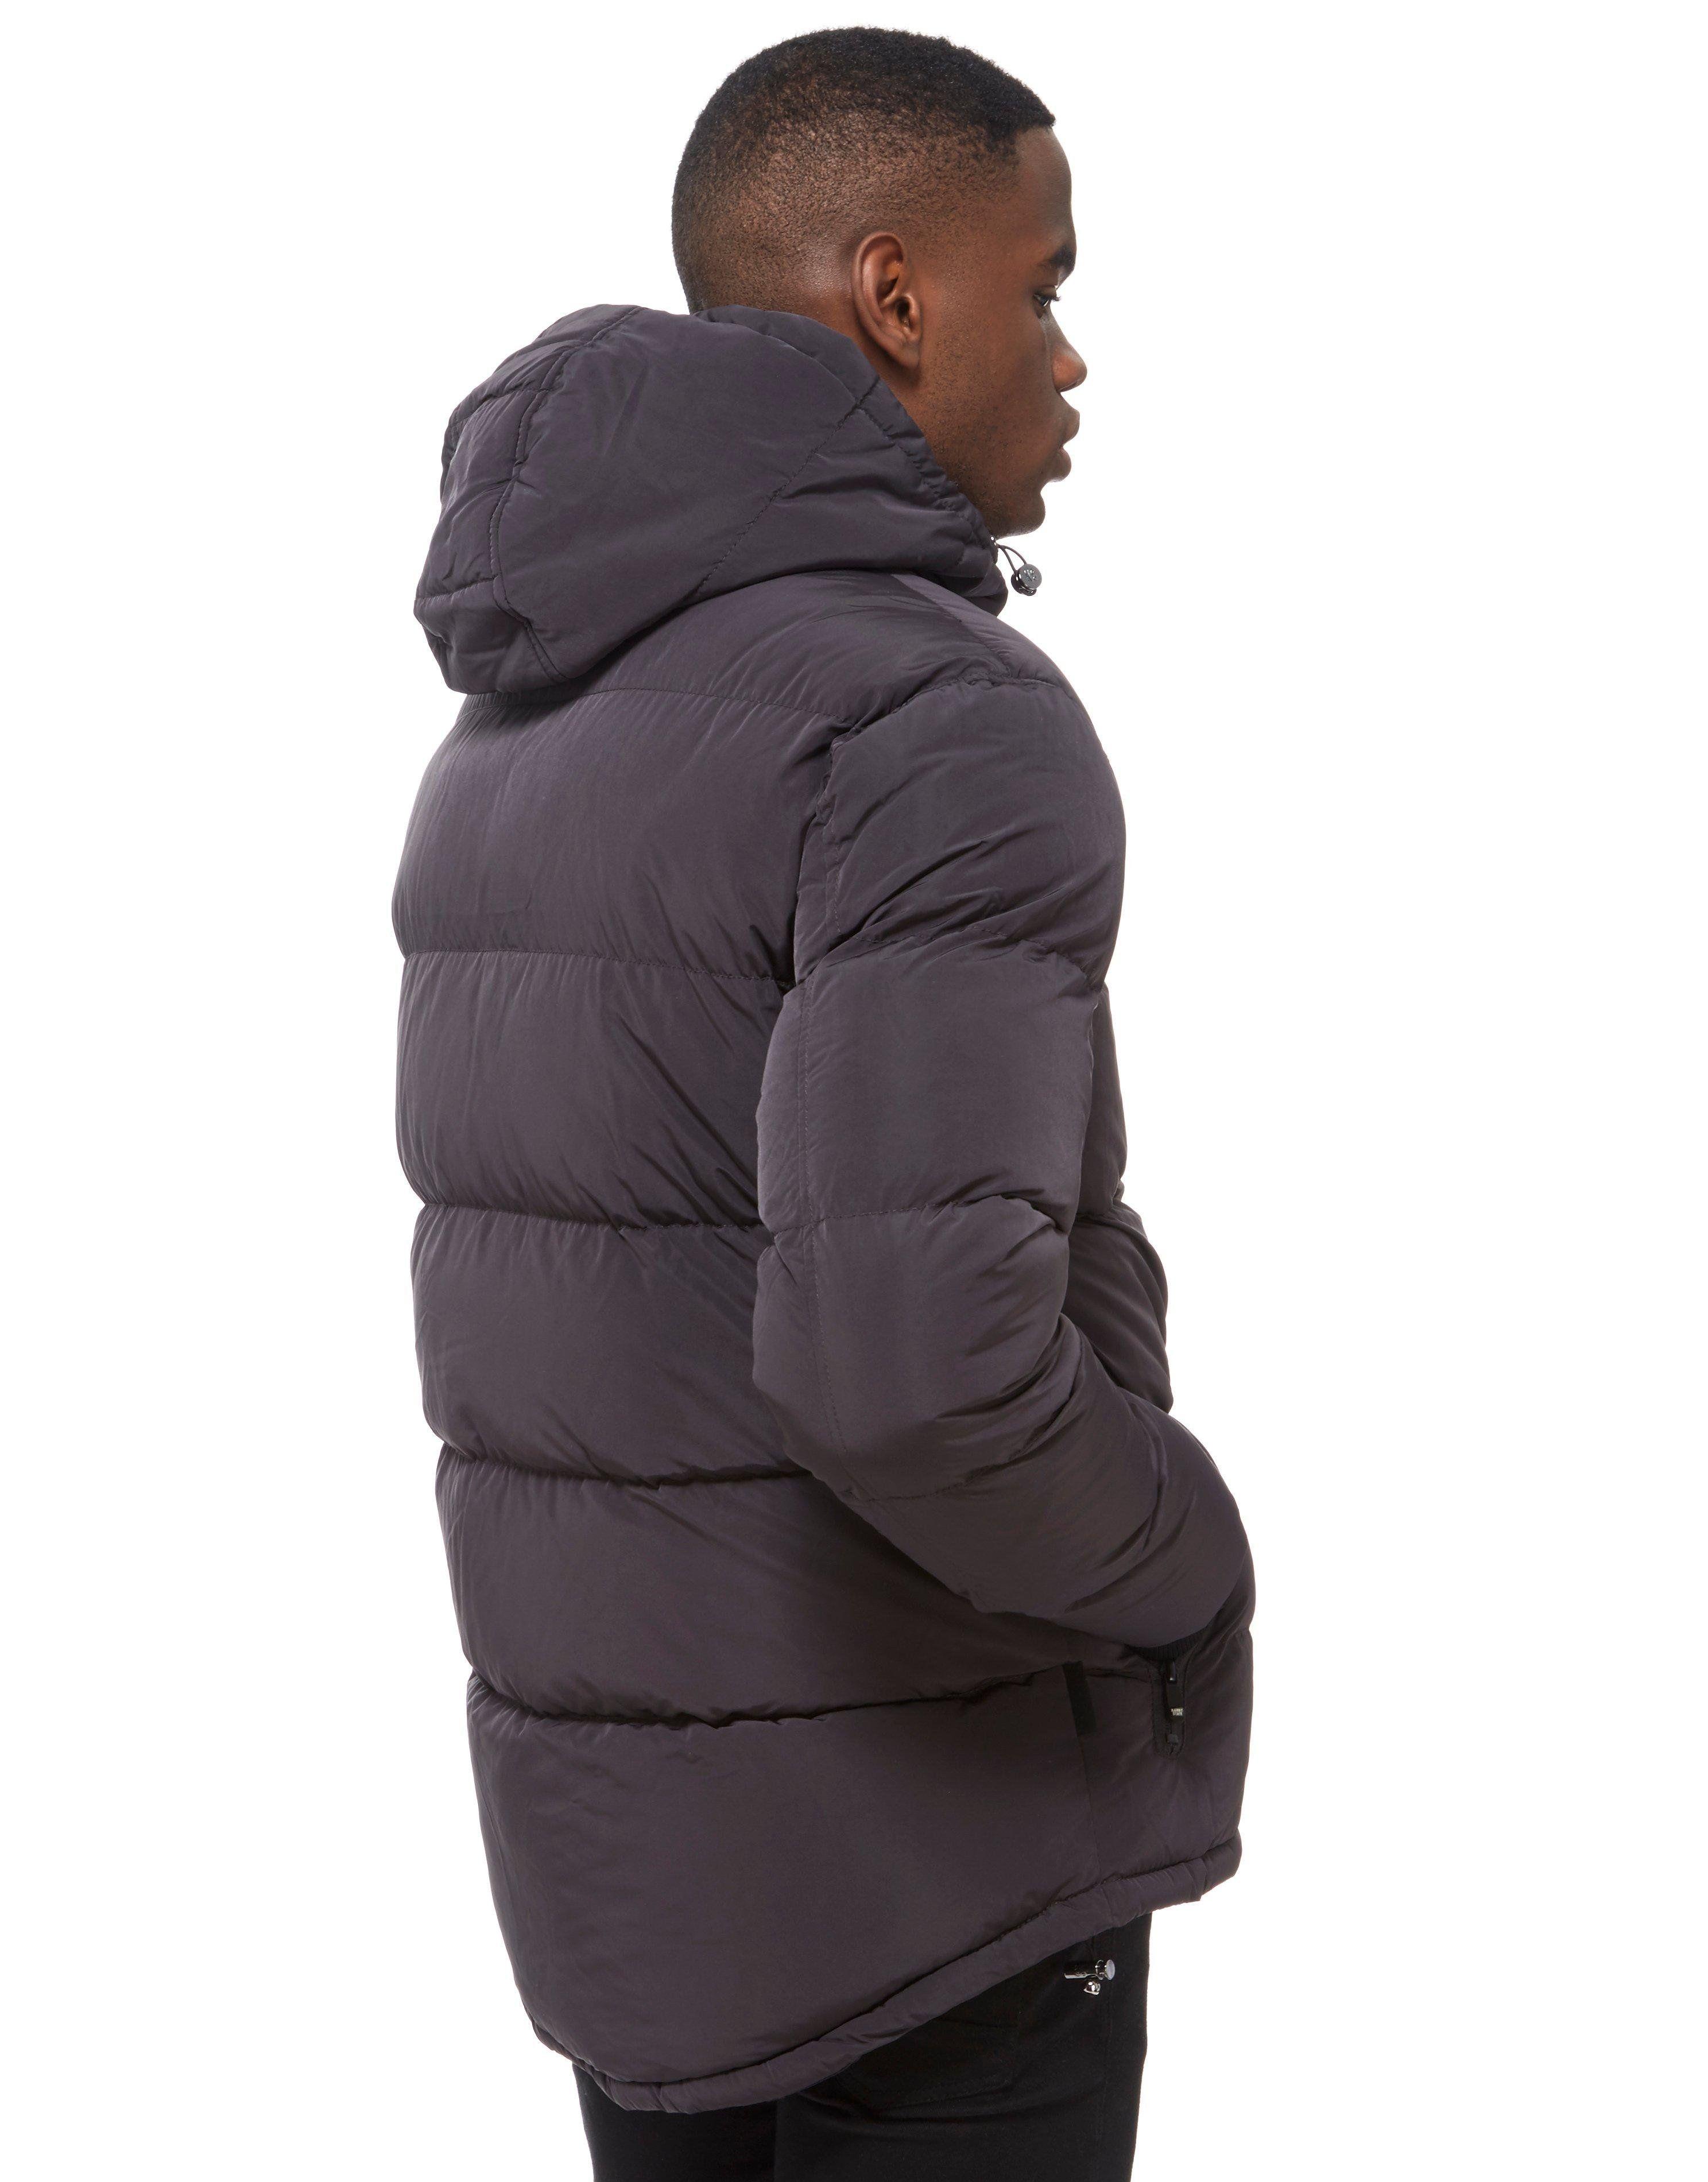 MISCELLANEOUS Hakon Puffa Jacket